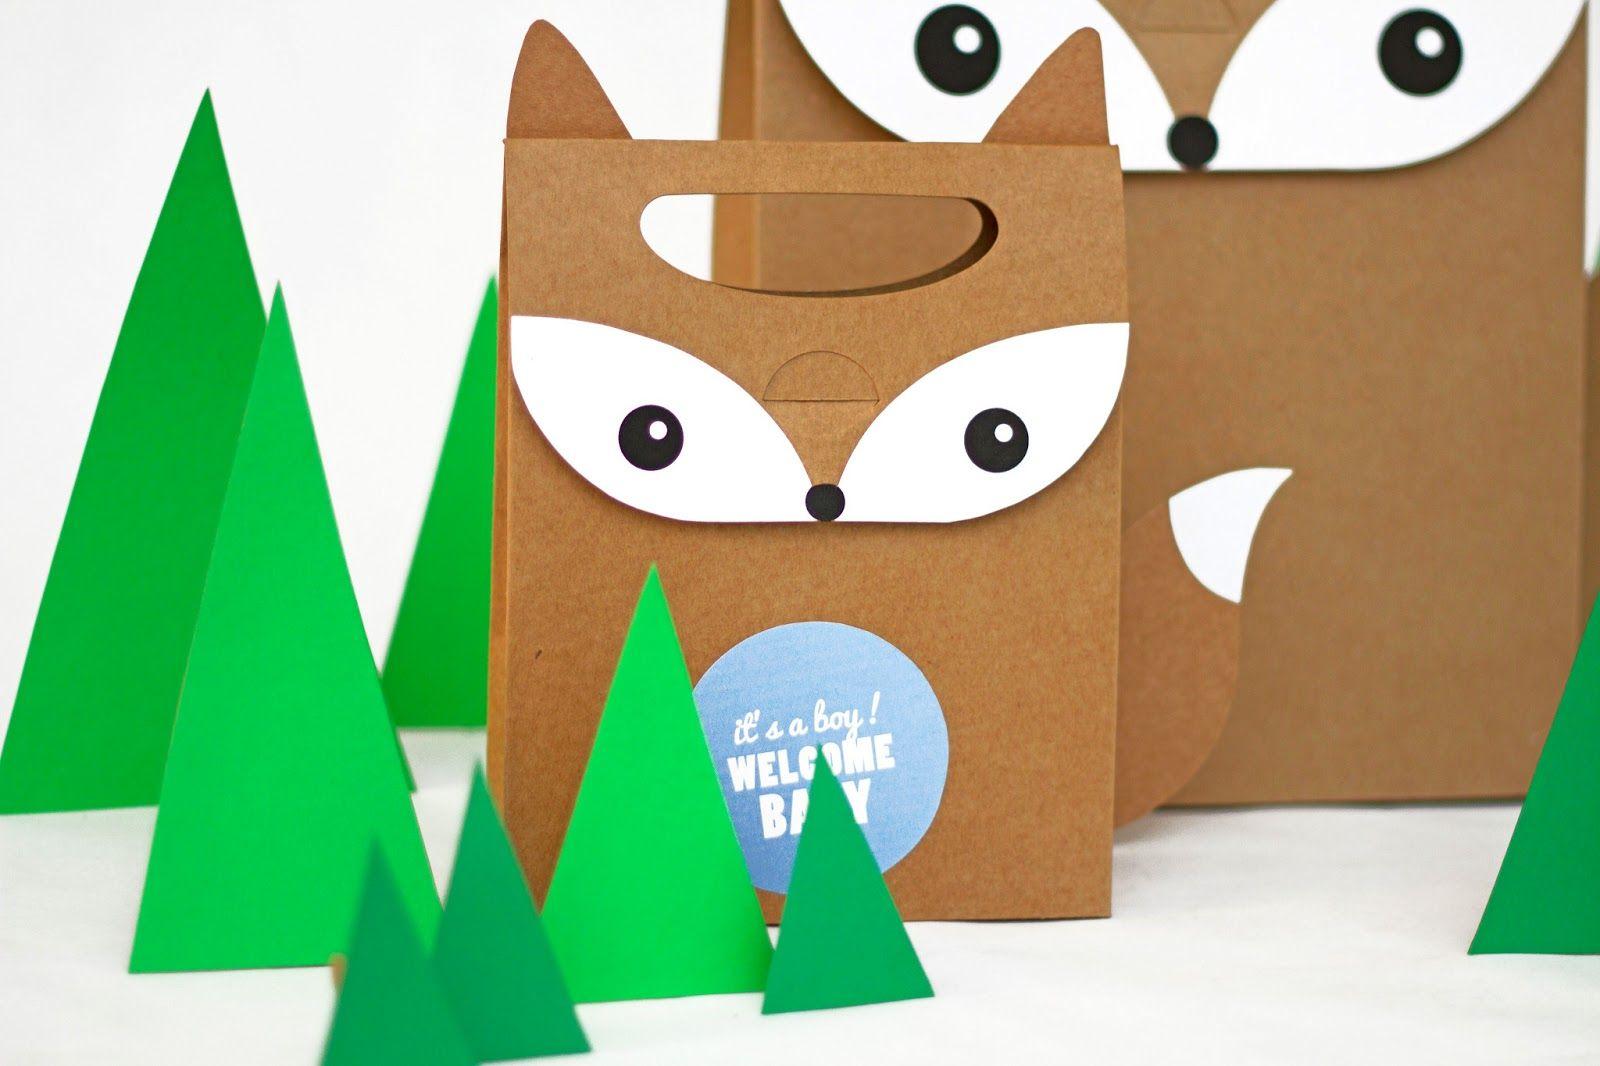 cajita zorro de cartón descargable gratis freebie selfpackaging self packaging selfpacking